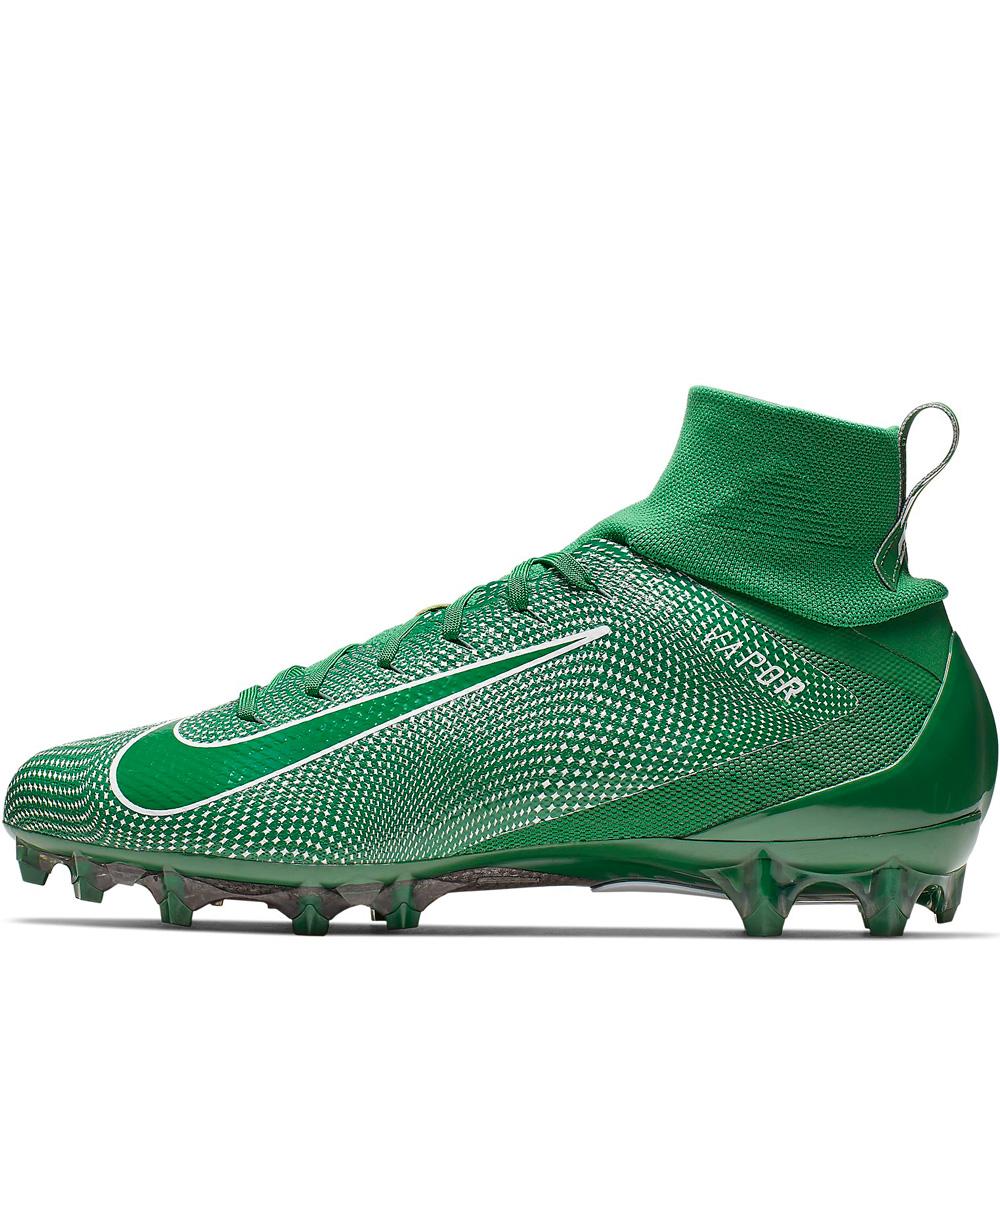 Vapor Untouchable 3 Pro Zapatos de Fútbol Americano para Hombre Pine Green